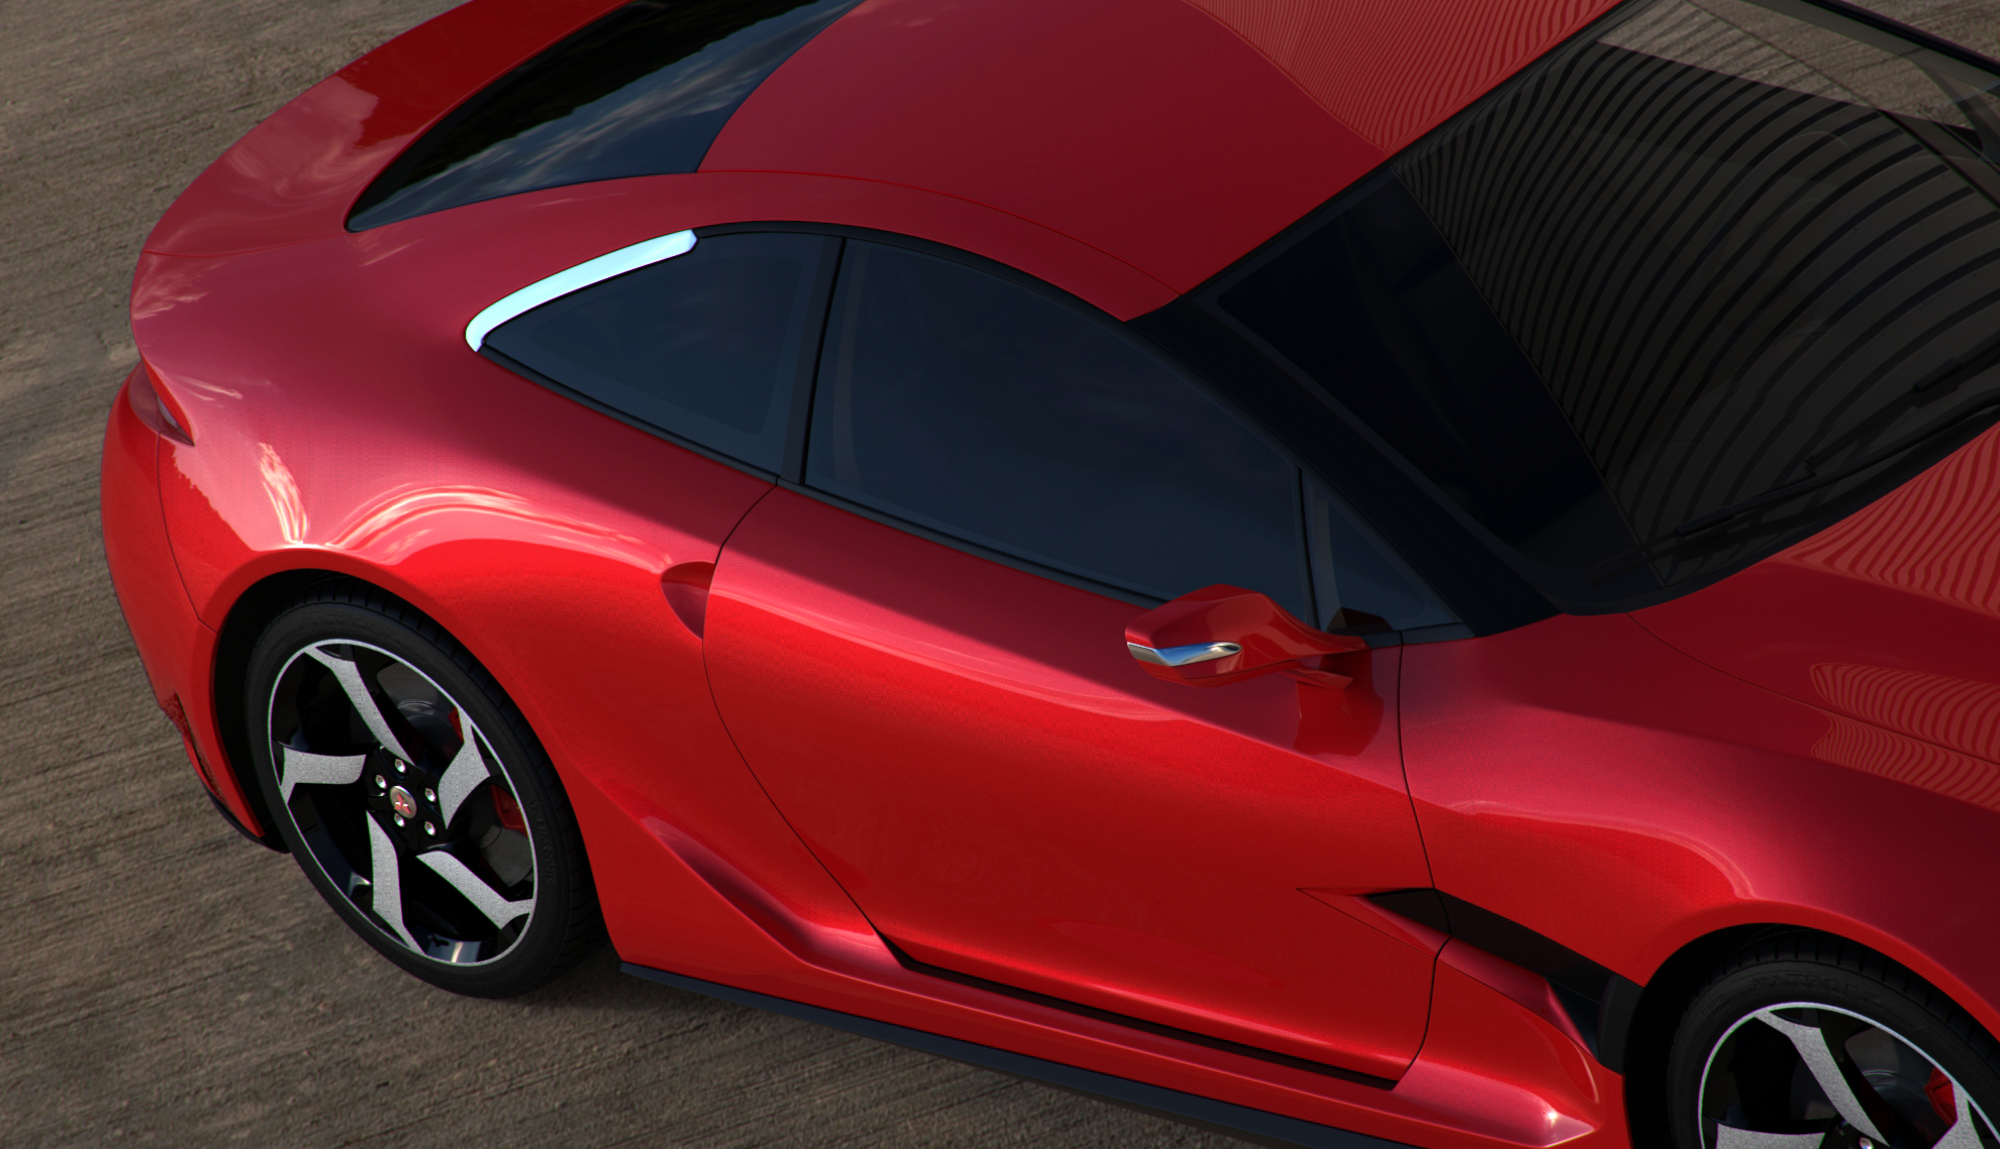 2015 Mitsubishi Eclipse >> Index Of Img 2015 Mitsubishi Eclipse R Concept